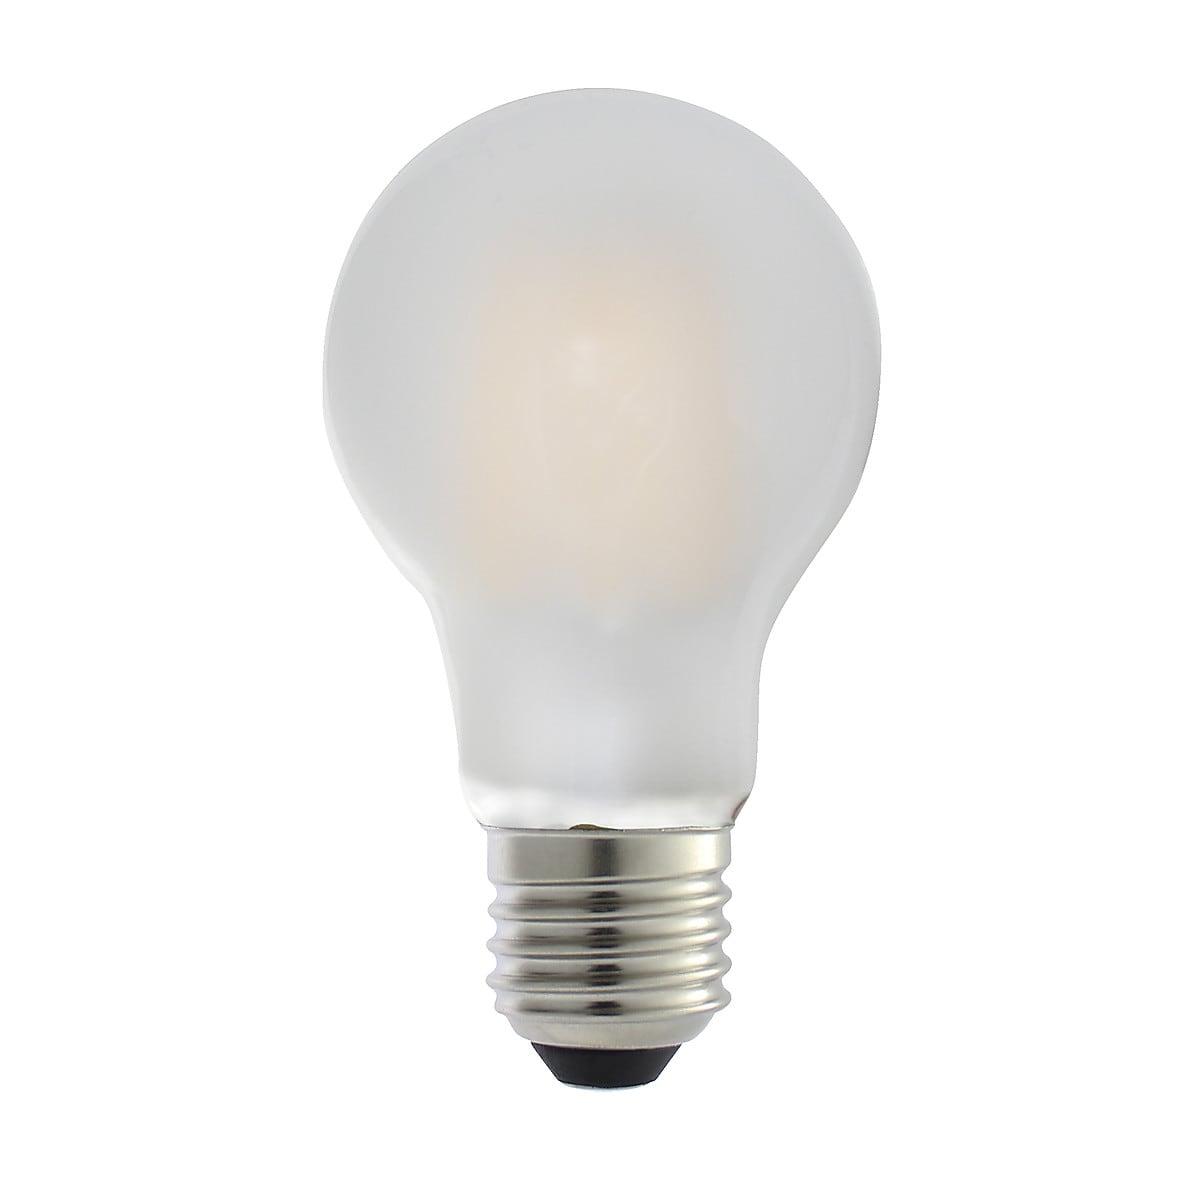 Clas Ohlson E27 Dimmable LED GLS Bulb